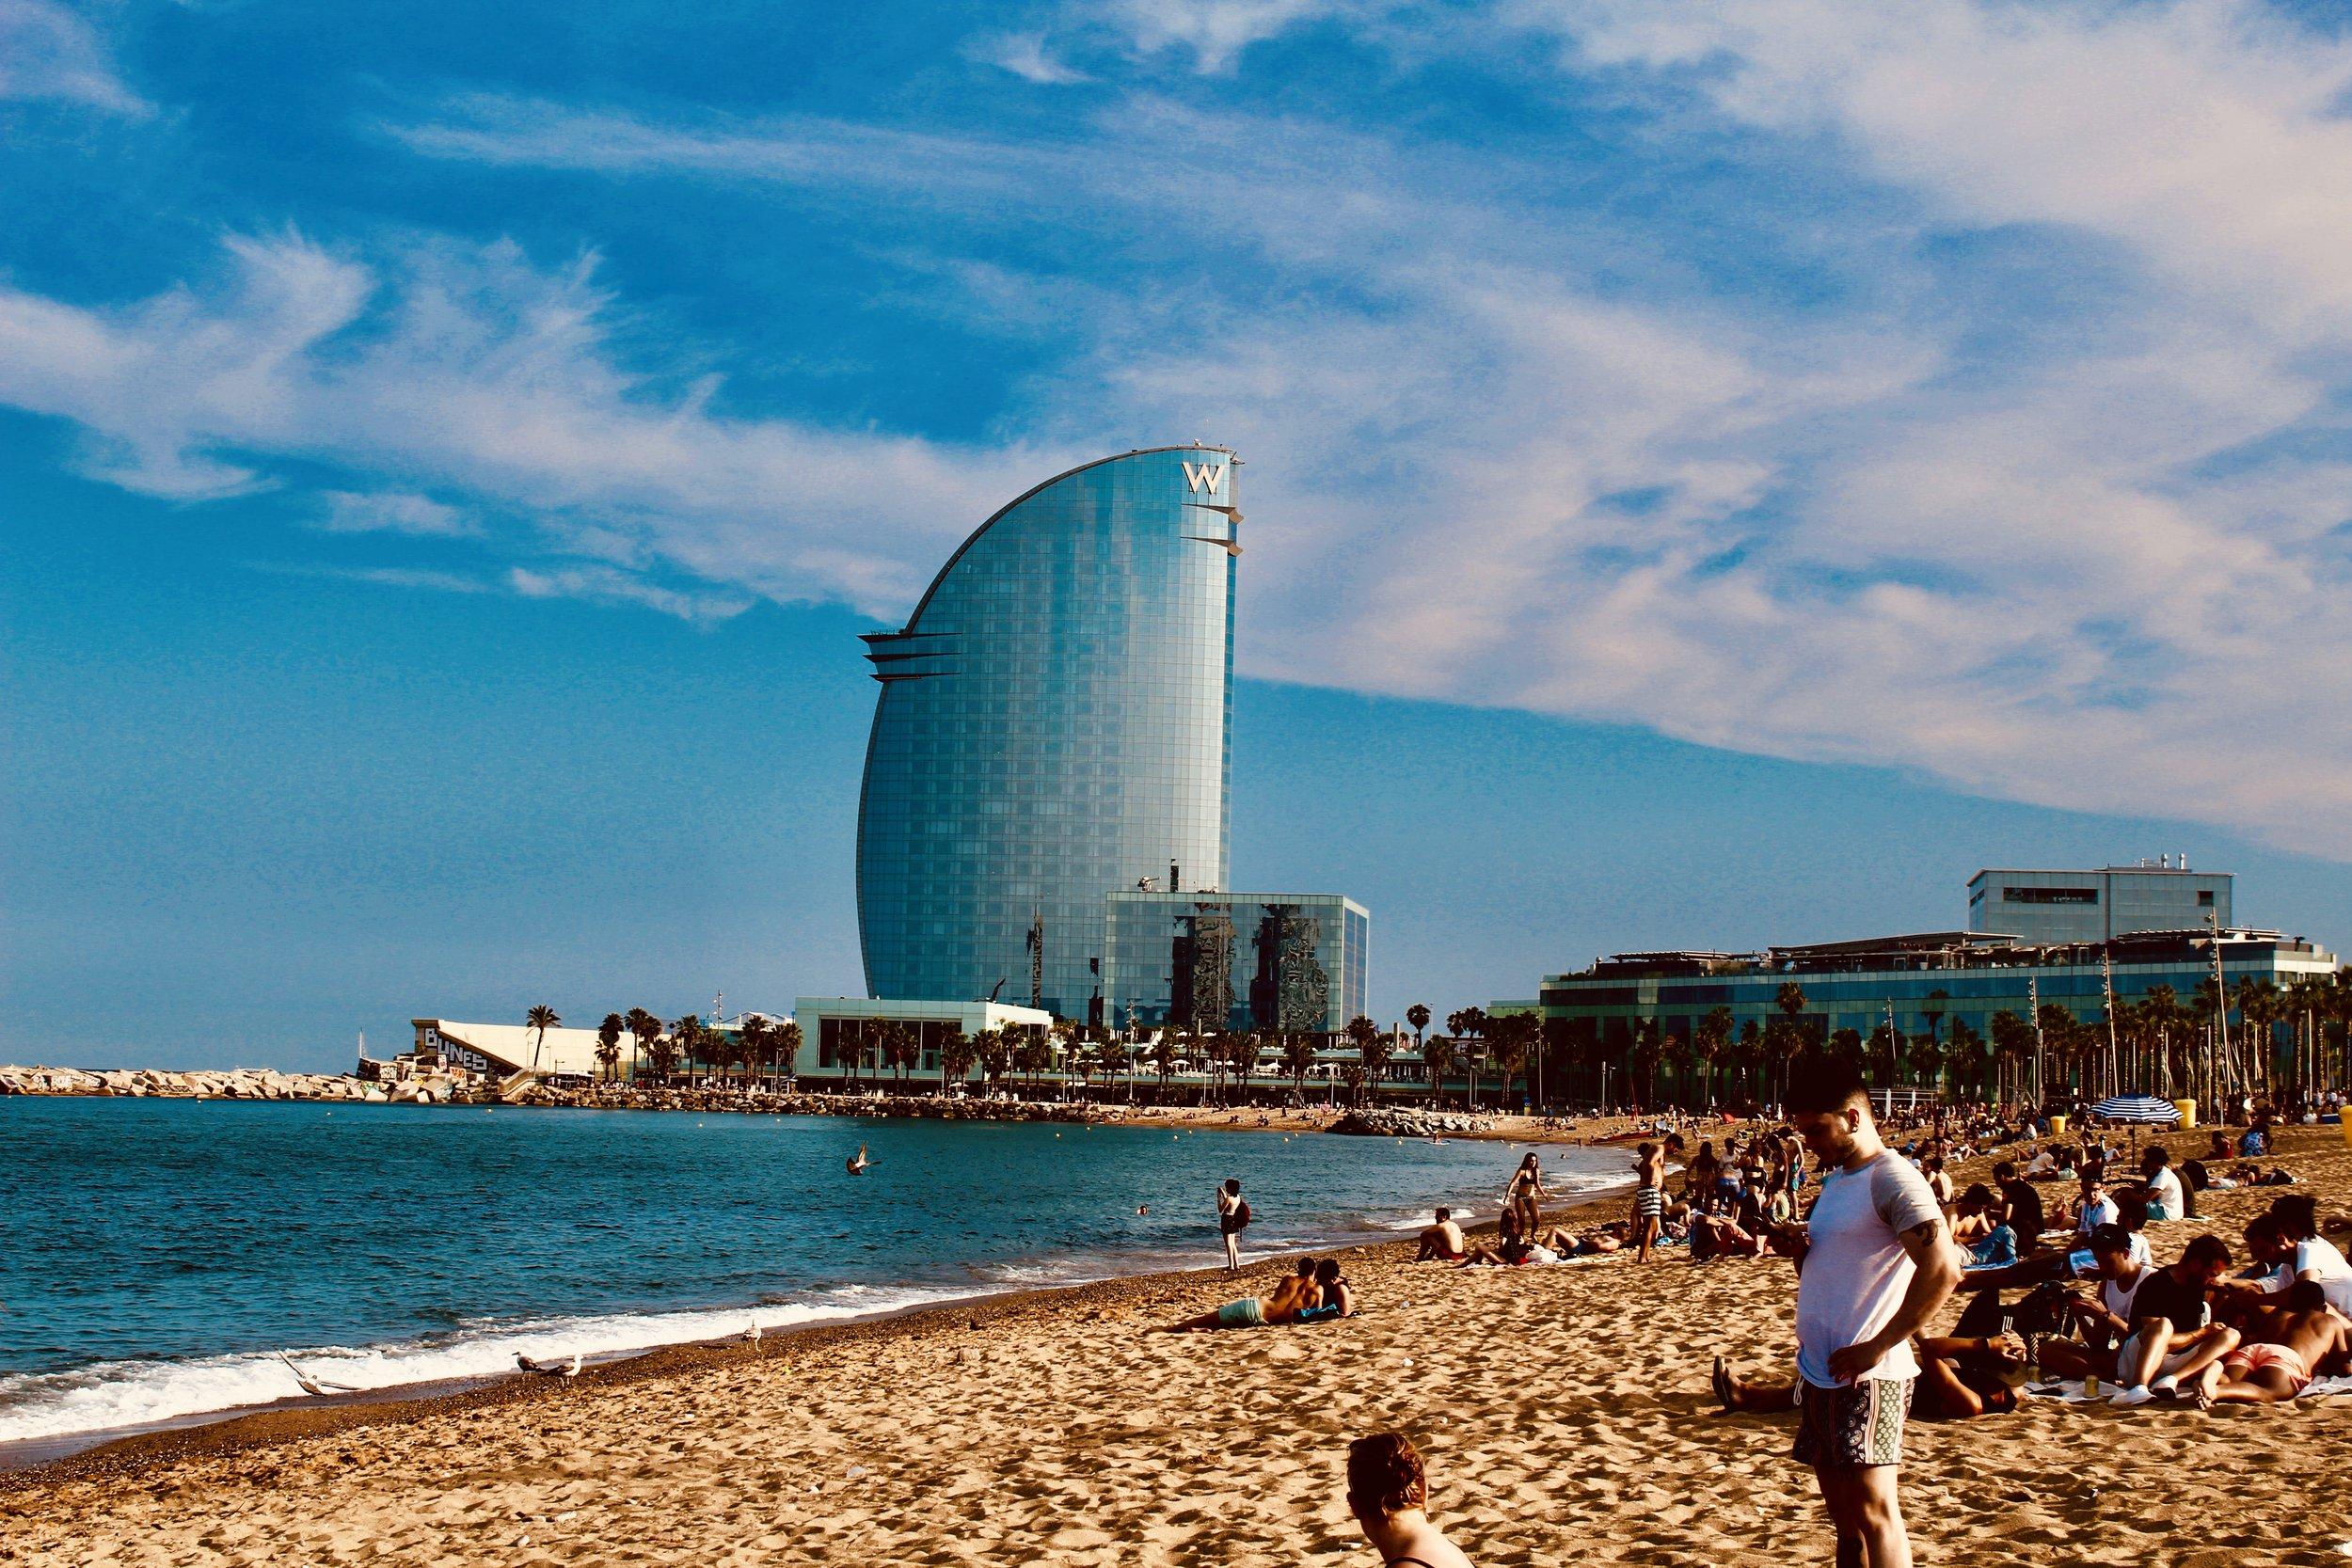 Barceloneta - W Hotel